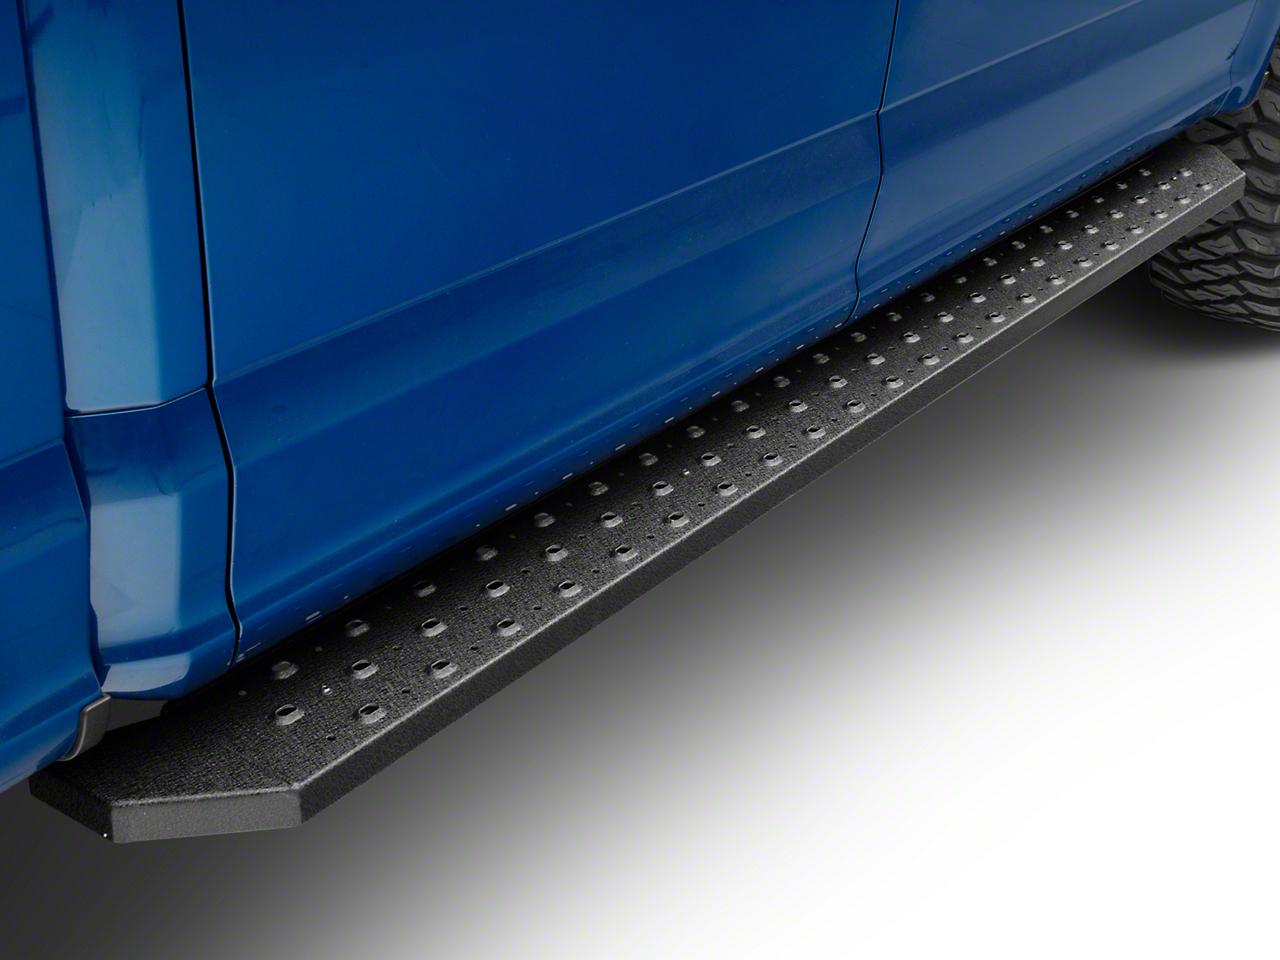 Aries Automotive 6.5 in. Ridgestep Running Boards - Textured Black (15-19 F-150 SuperCrew)